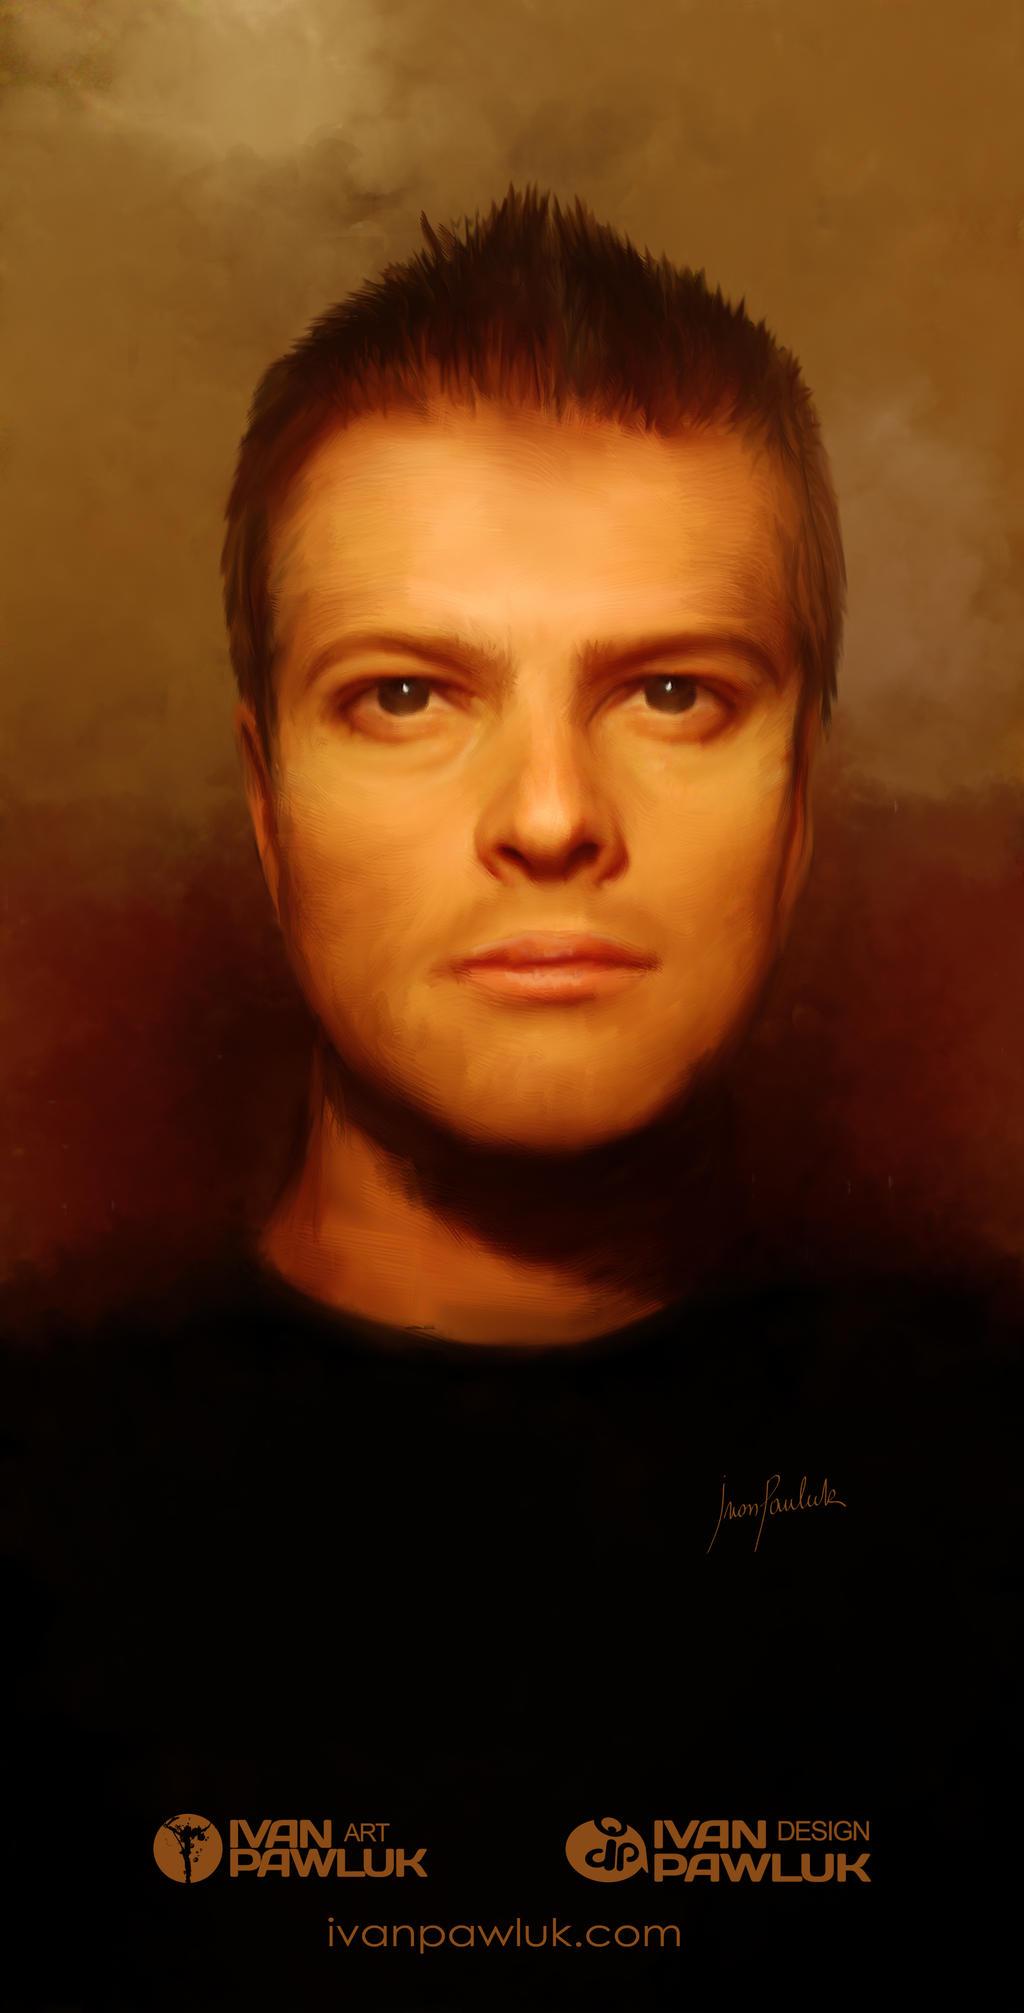 Ivan Pawluk digital art